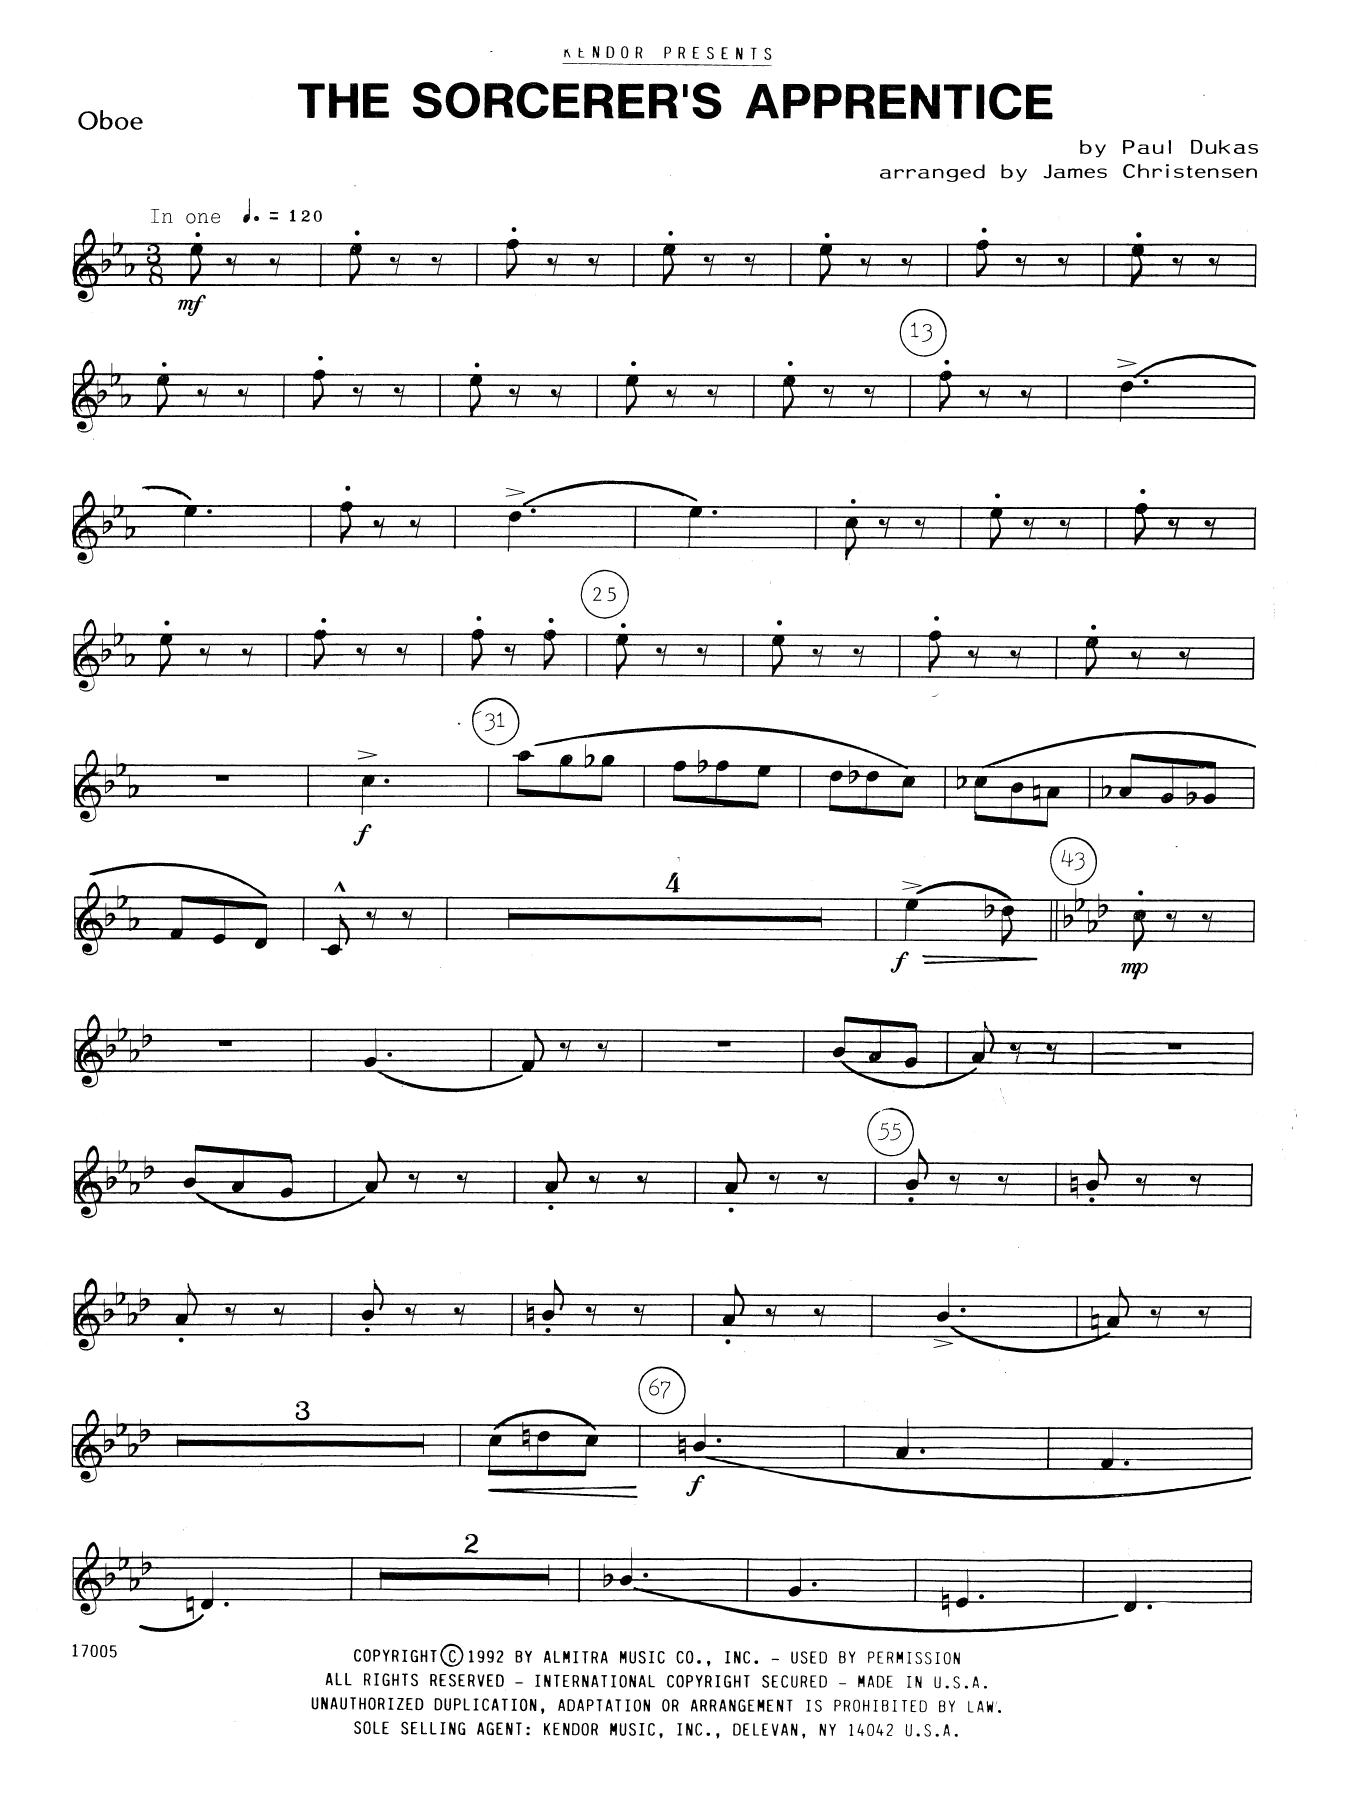 The Sorcerer's Apprentice - Oboe Sheet Music